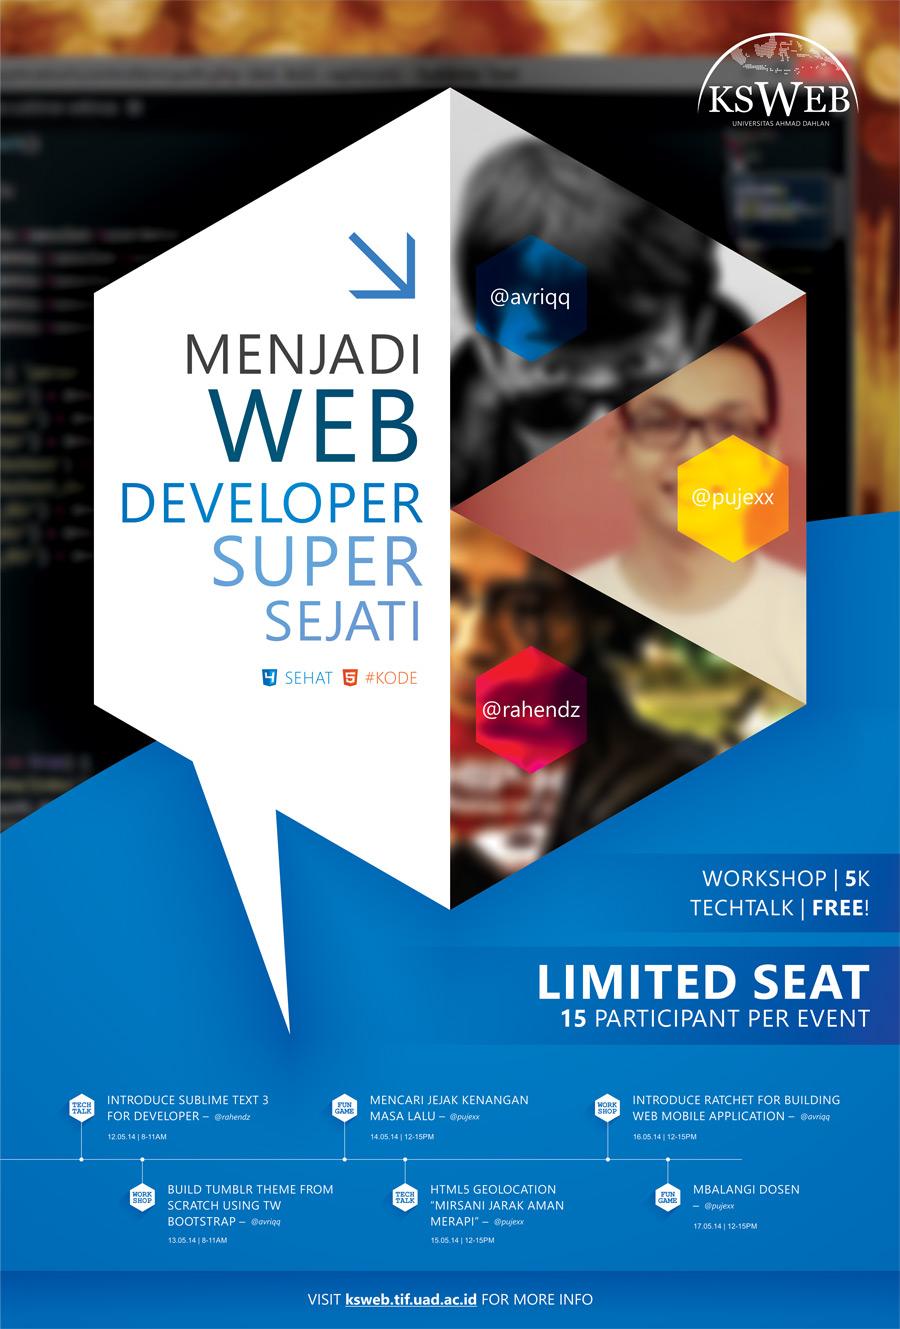 ksweb event - menjadi web developer super alami sejati